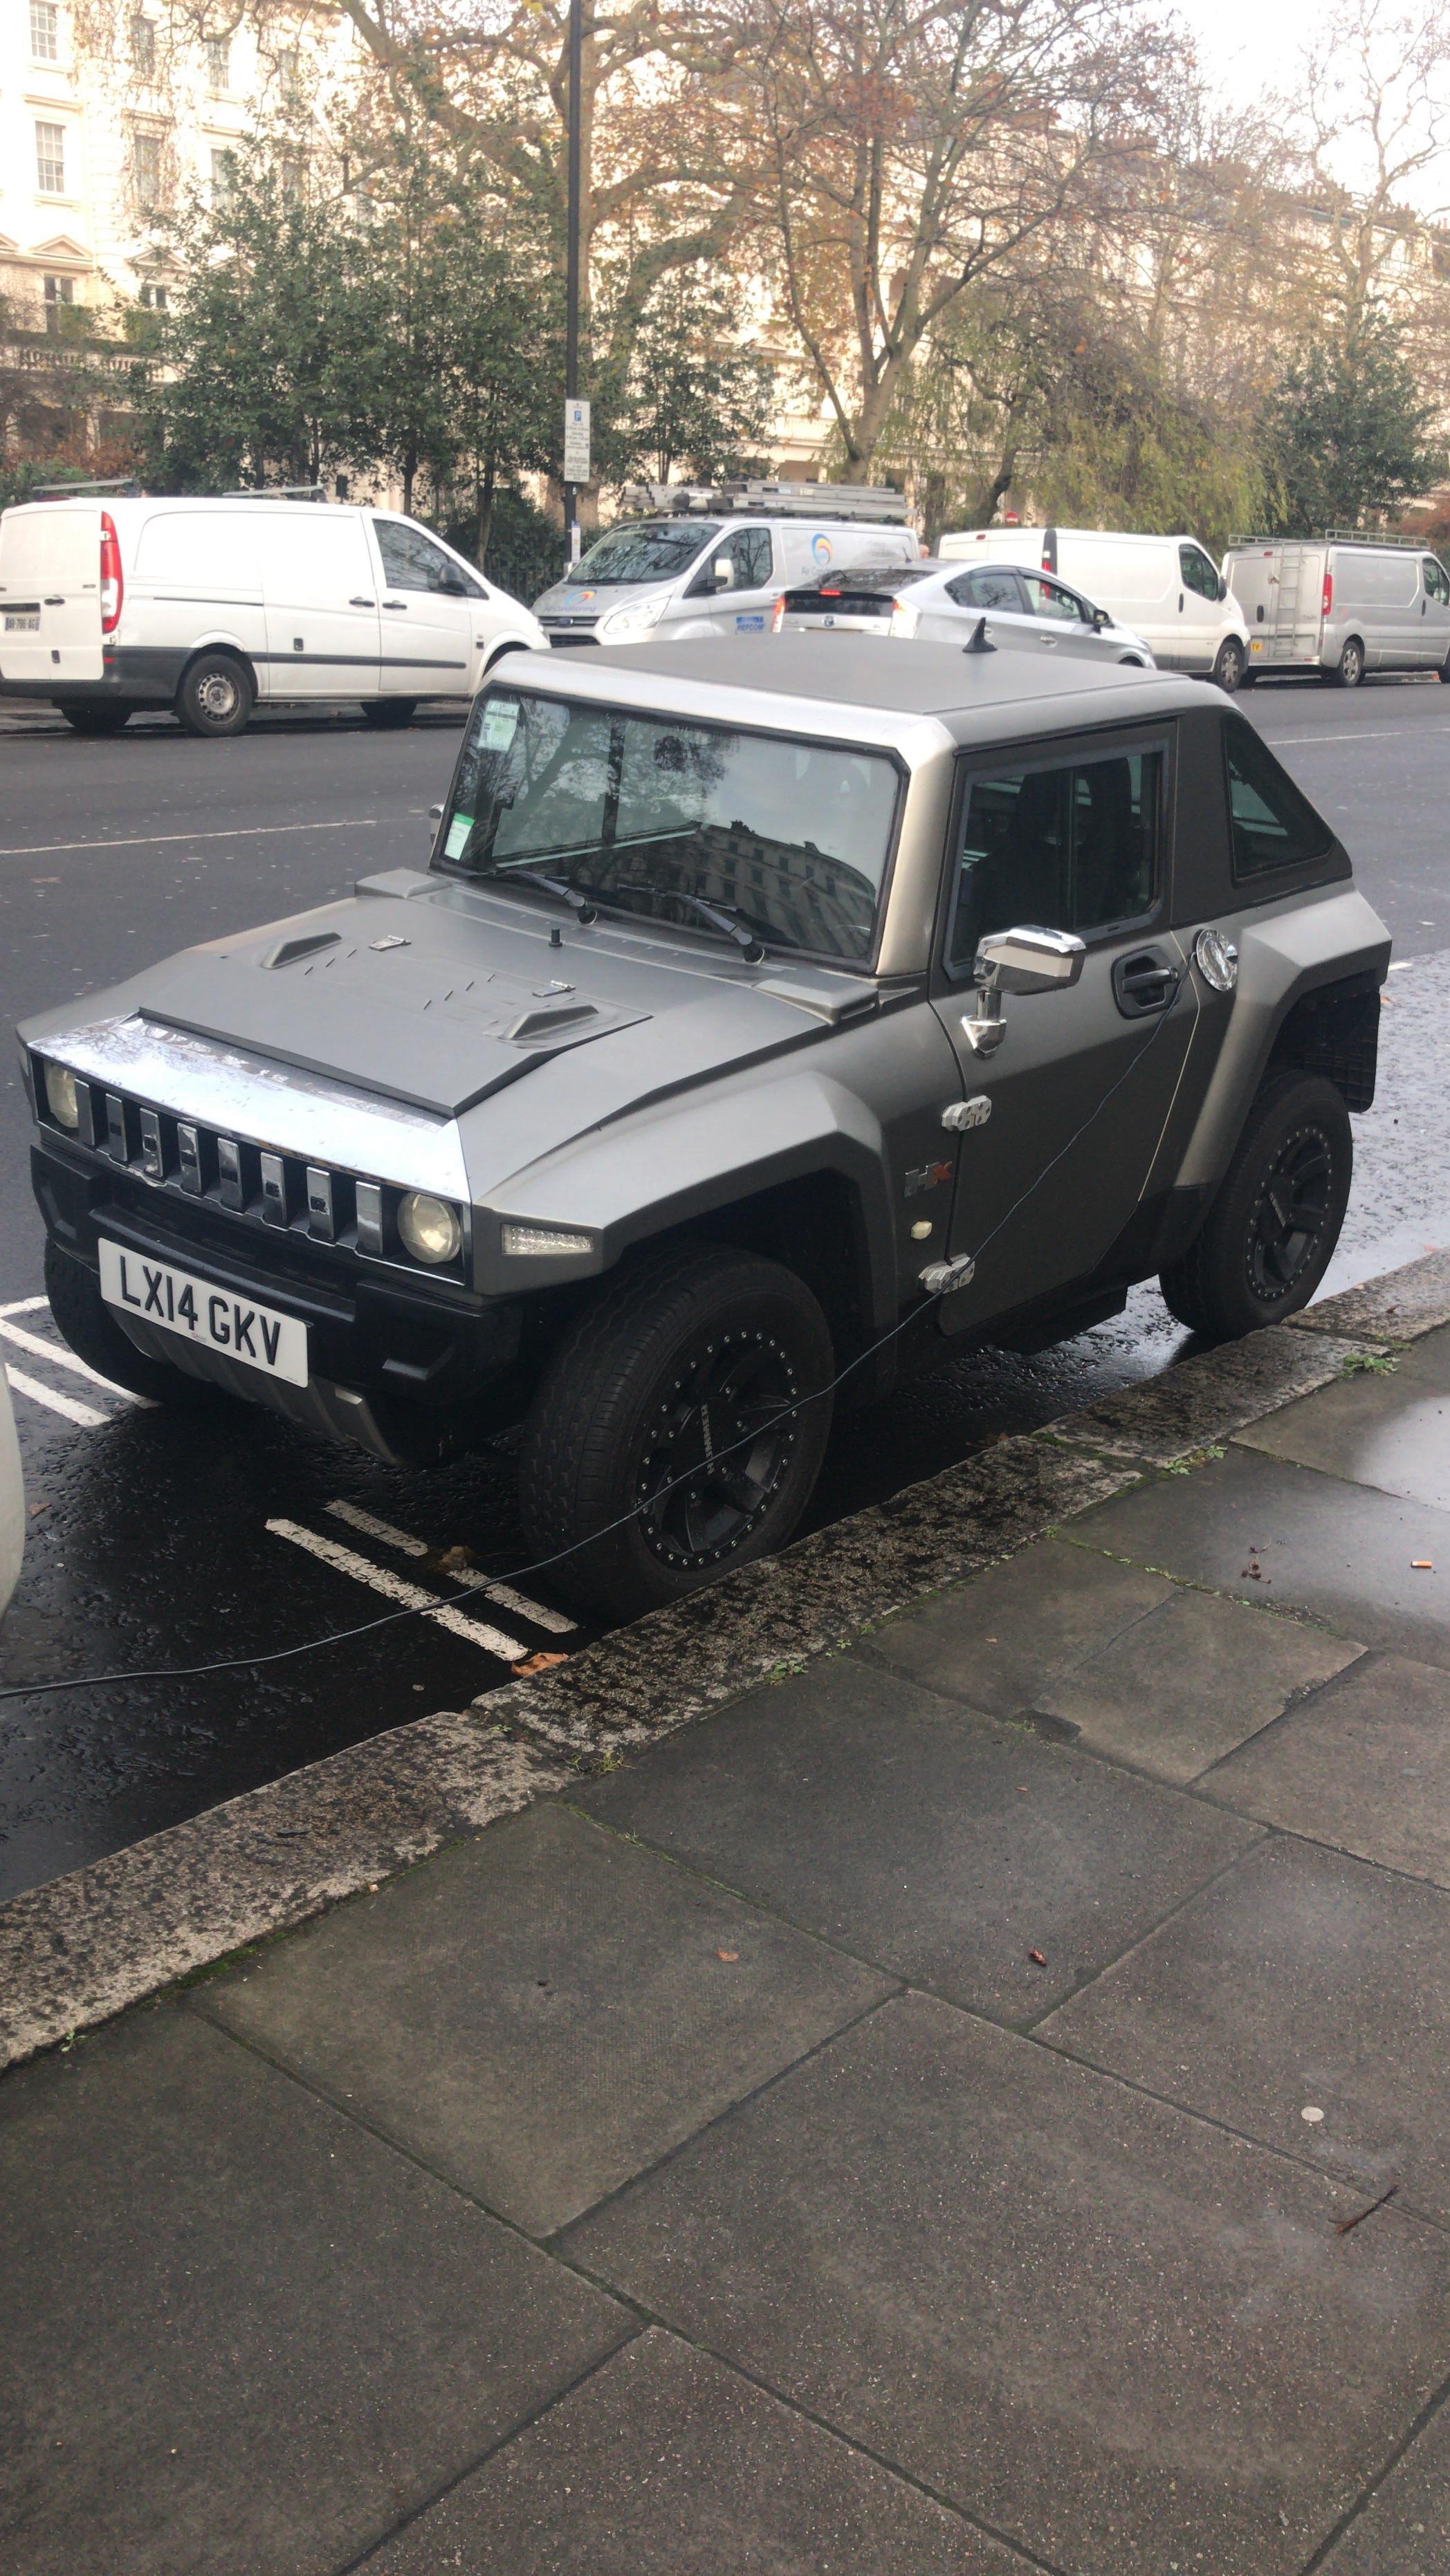 Today I saw a mini electric Hummer mildlyinteresting